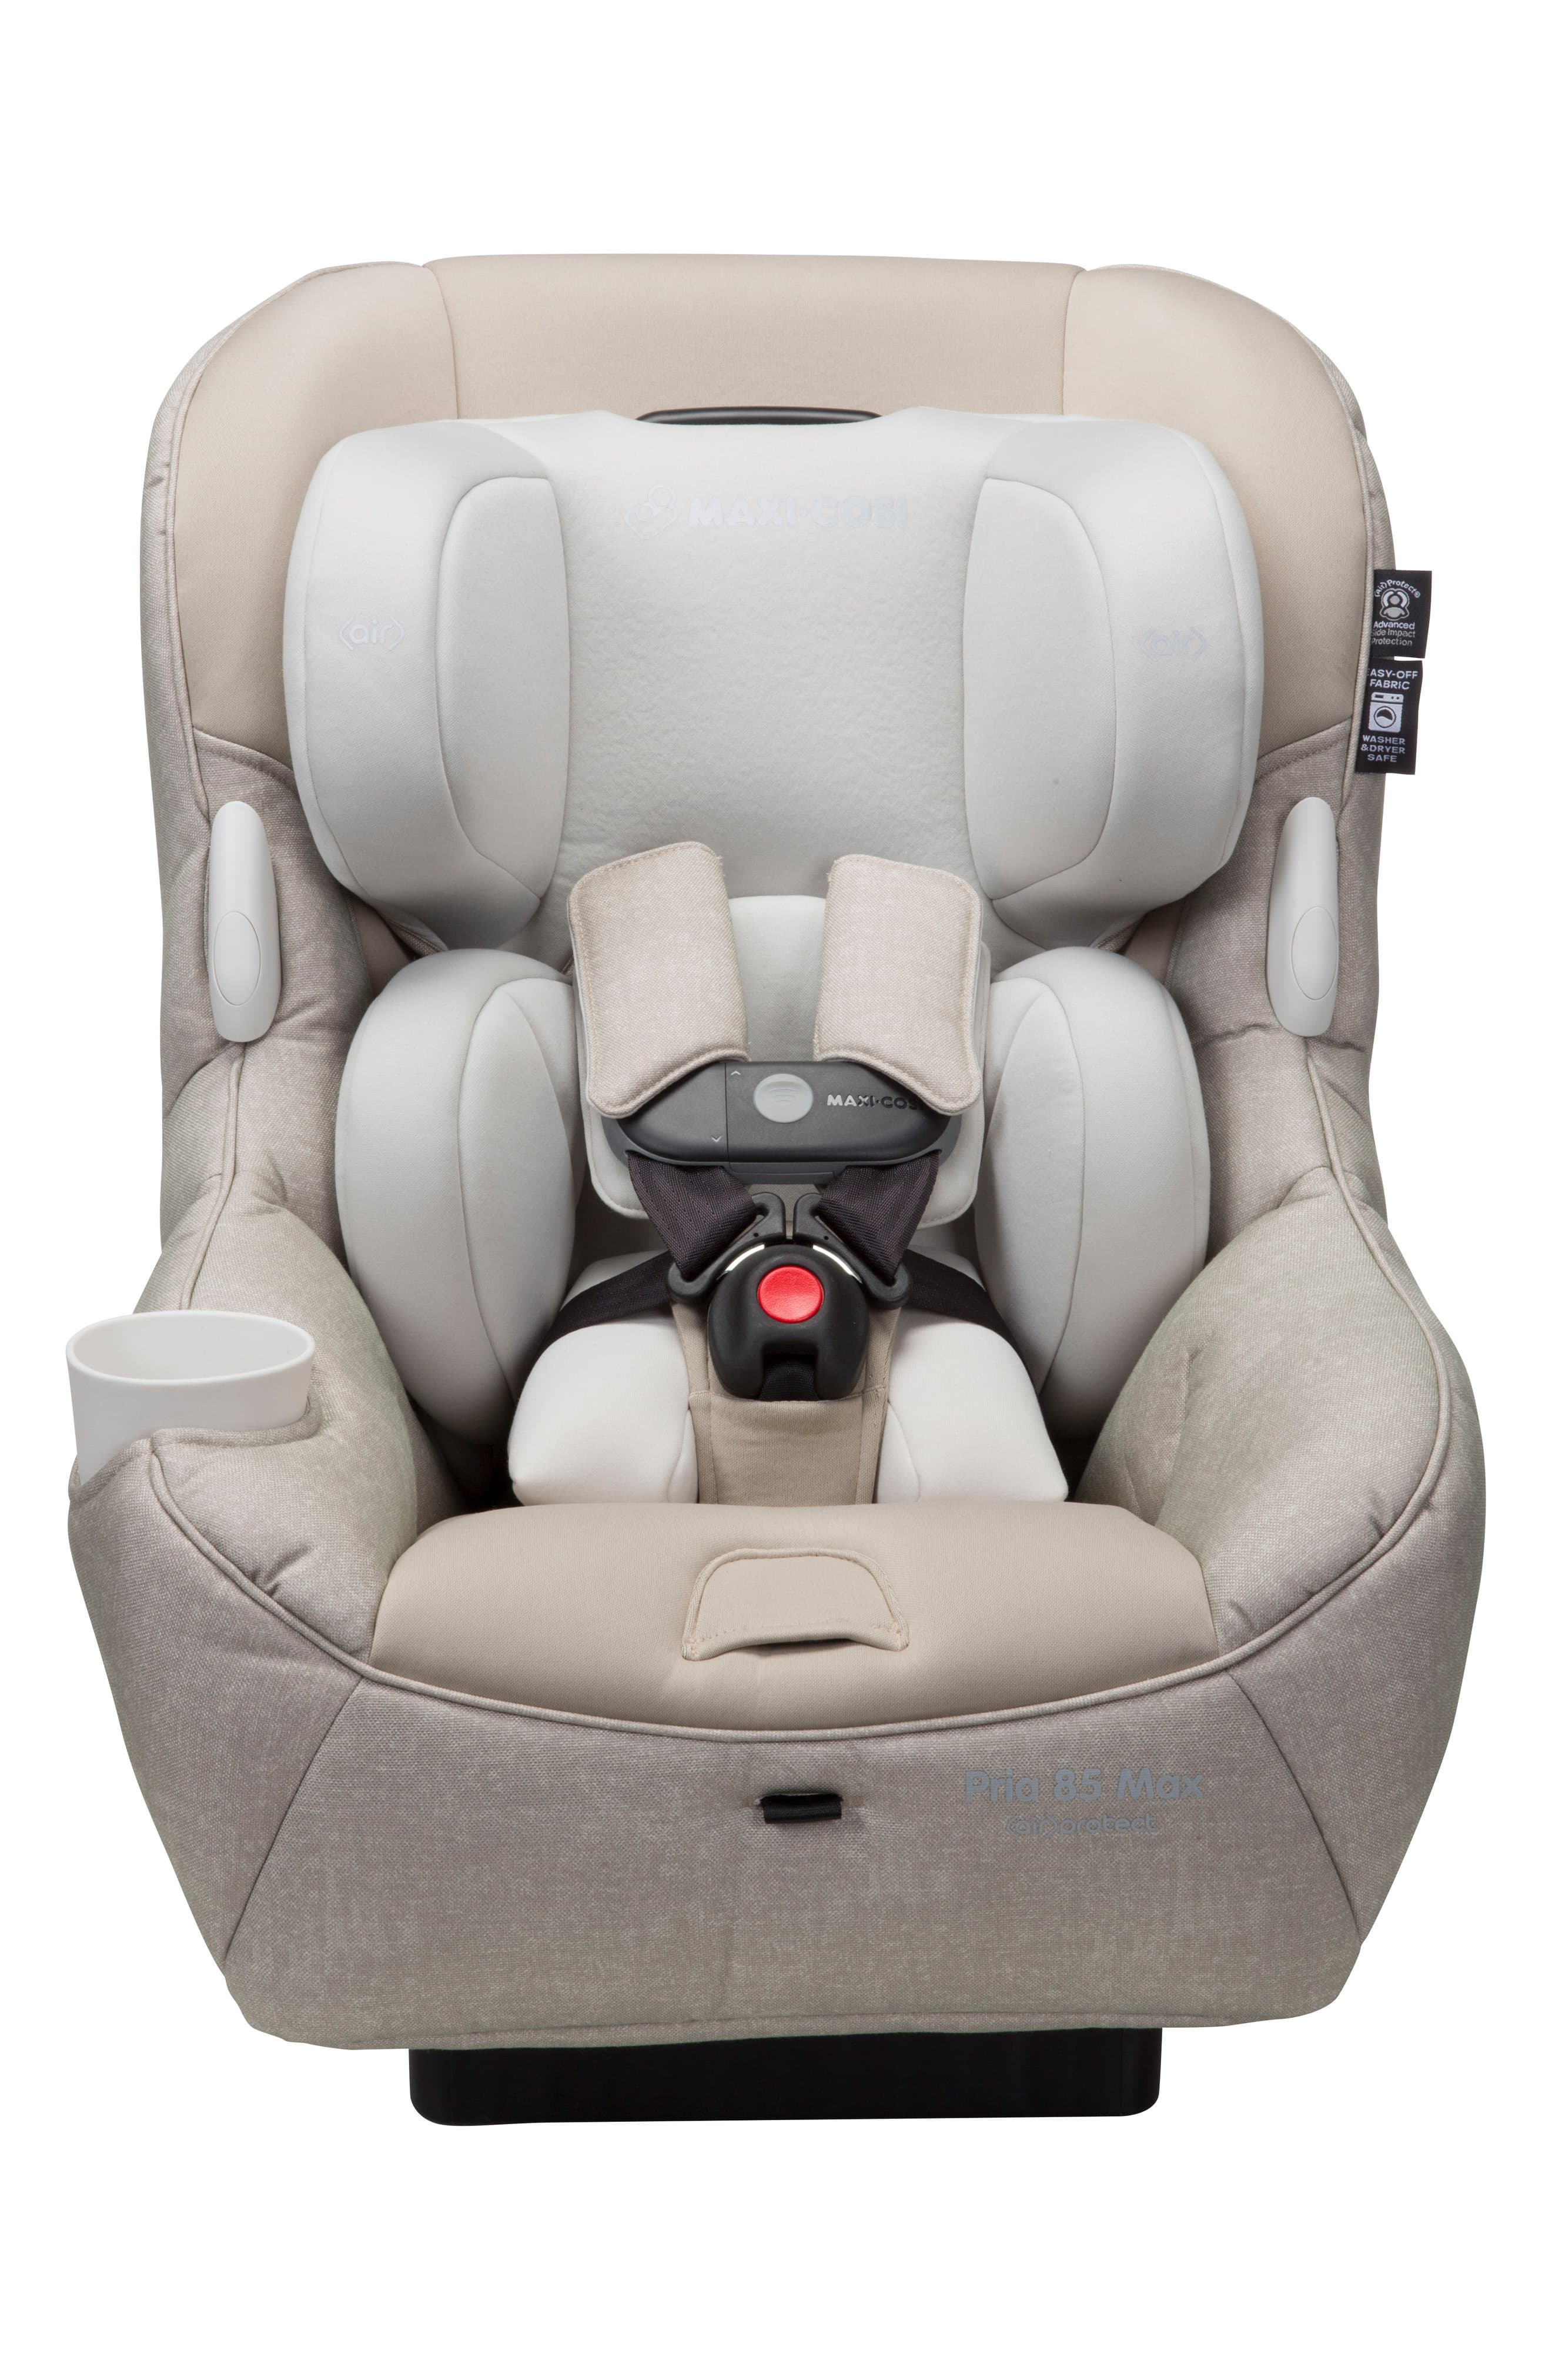 433d2165e683b02c35d56abc2334172f - How To Get Cover Off Maxi Cosi Car Seat